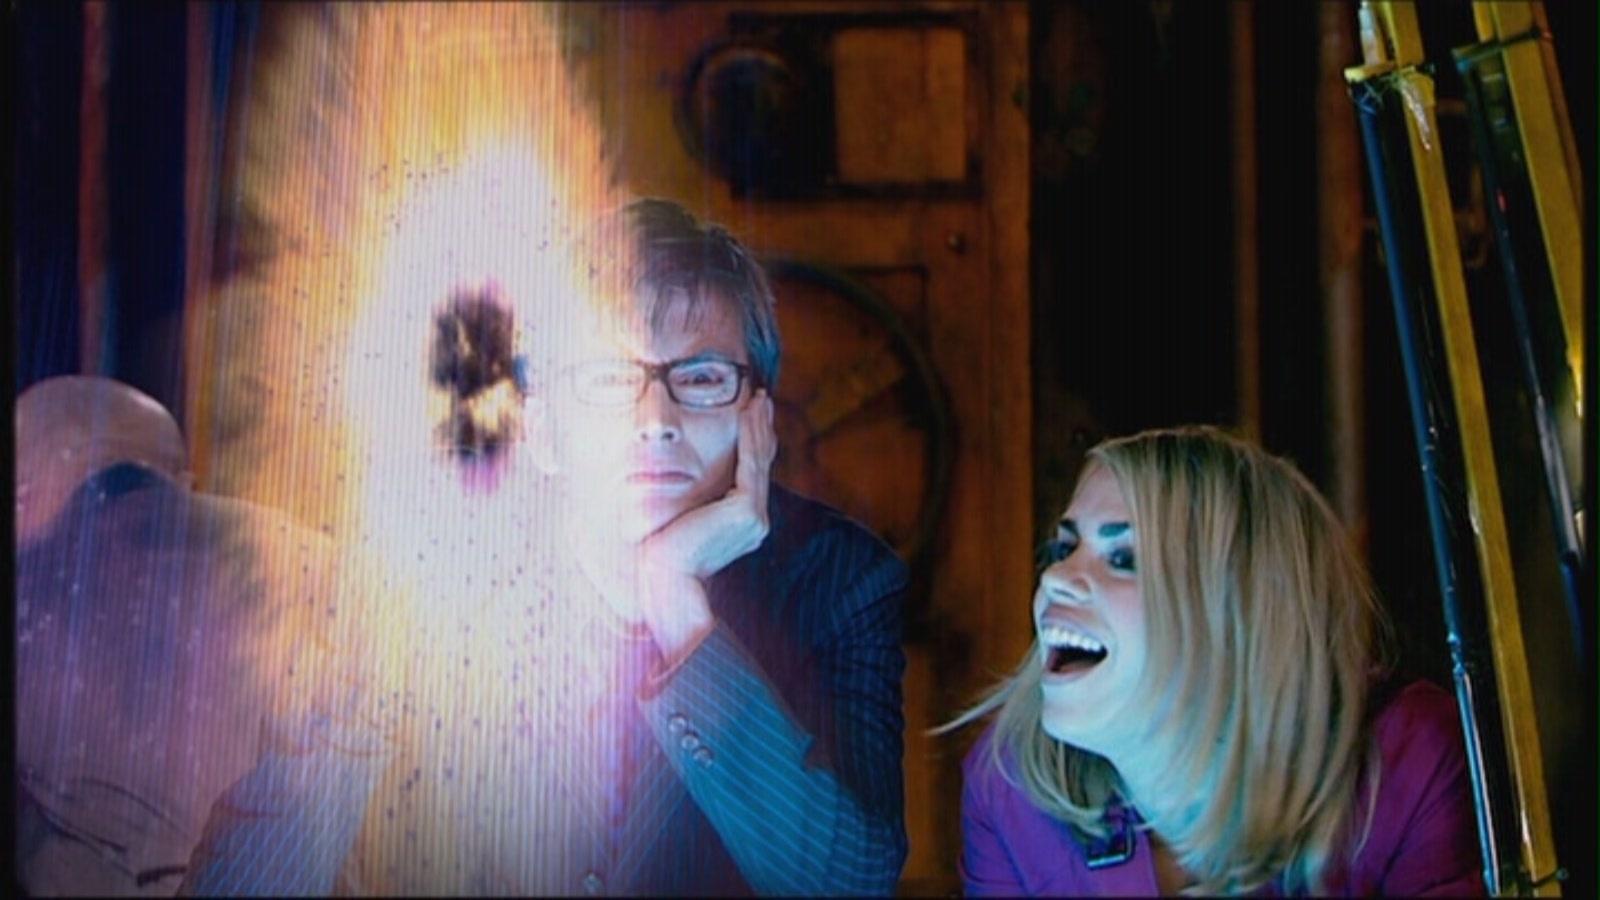 Watch doctor who season 3 episode 2 online free